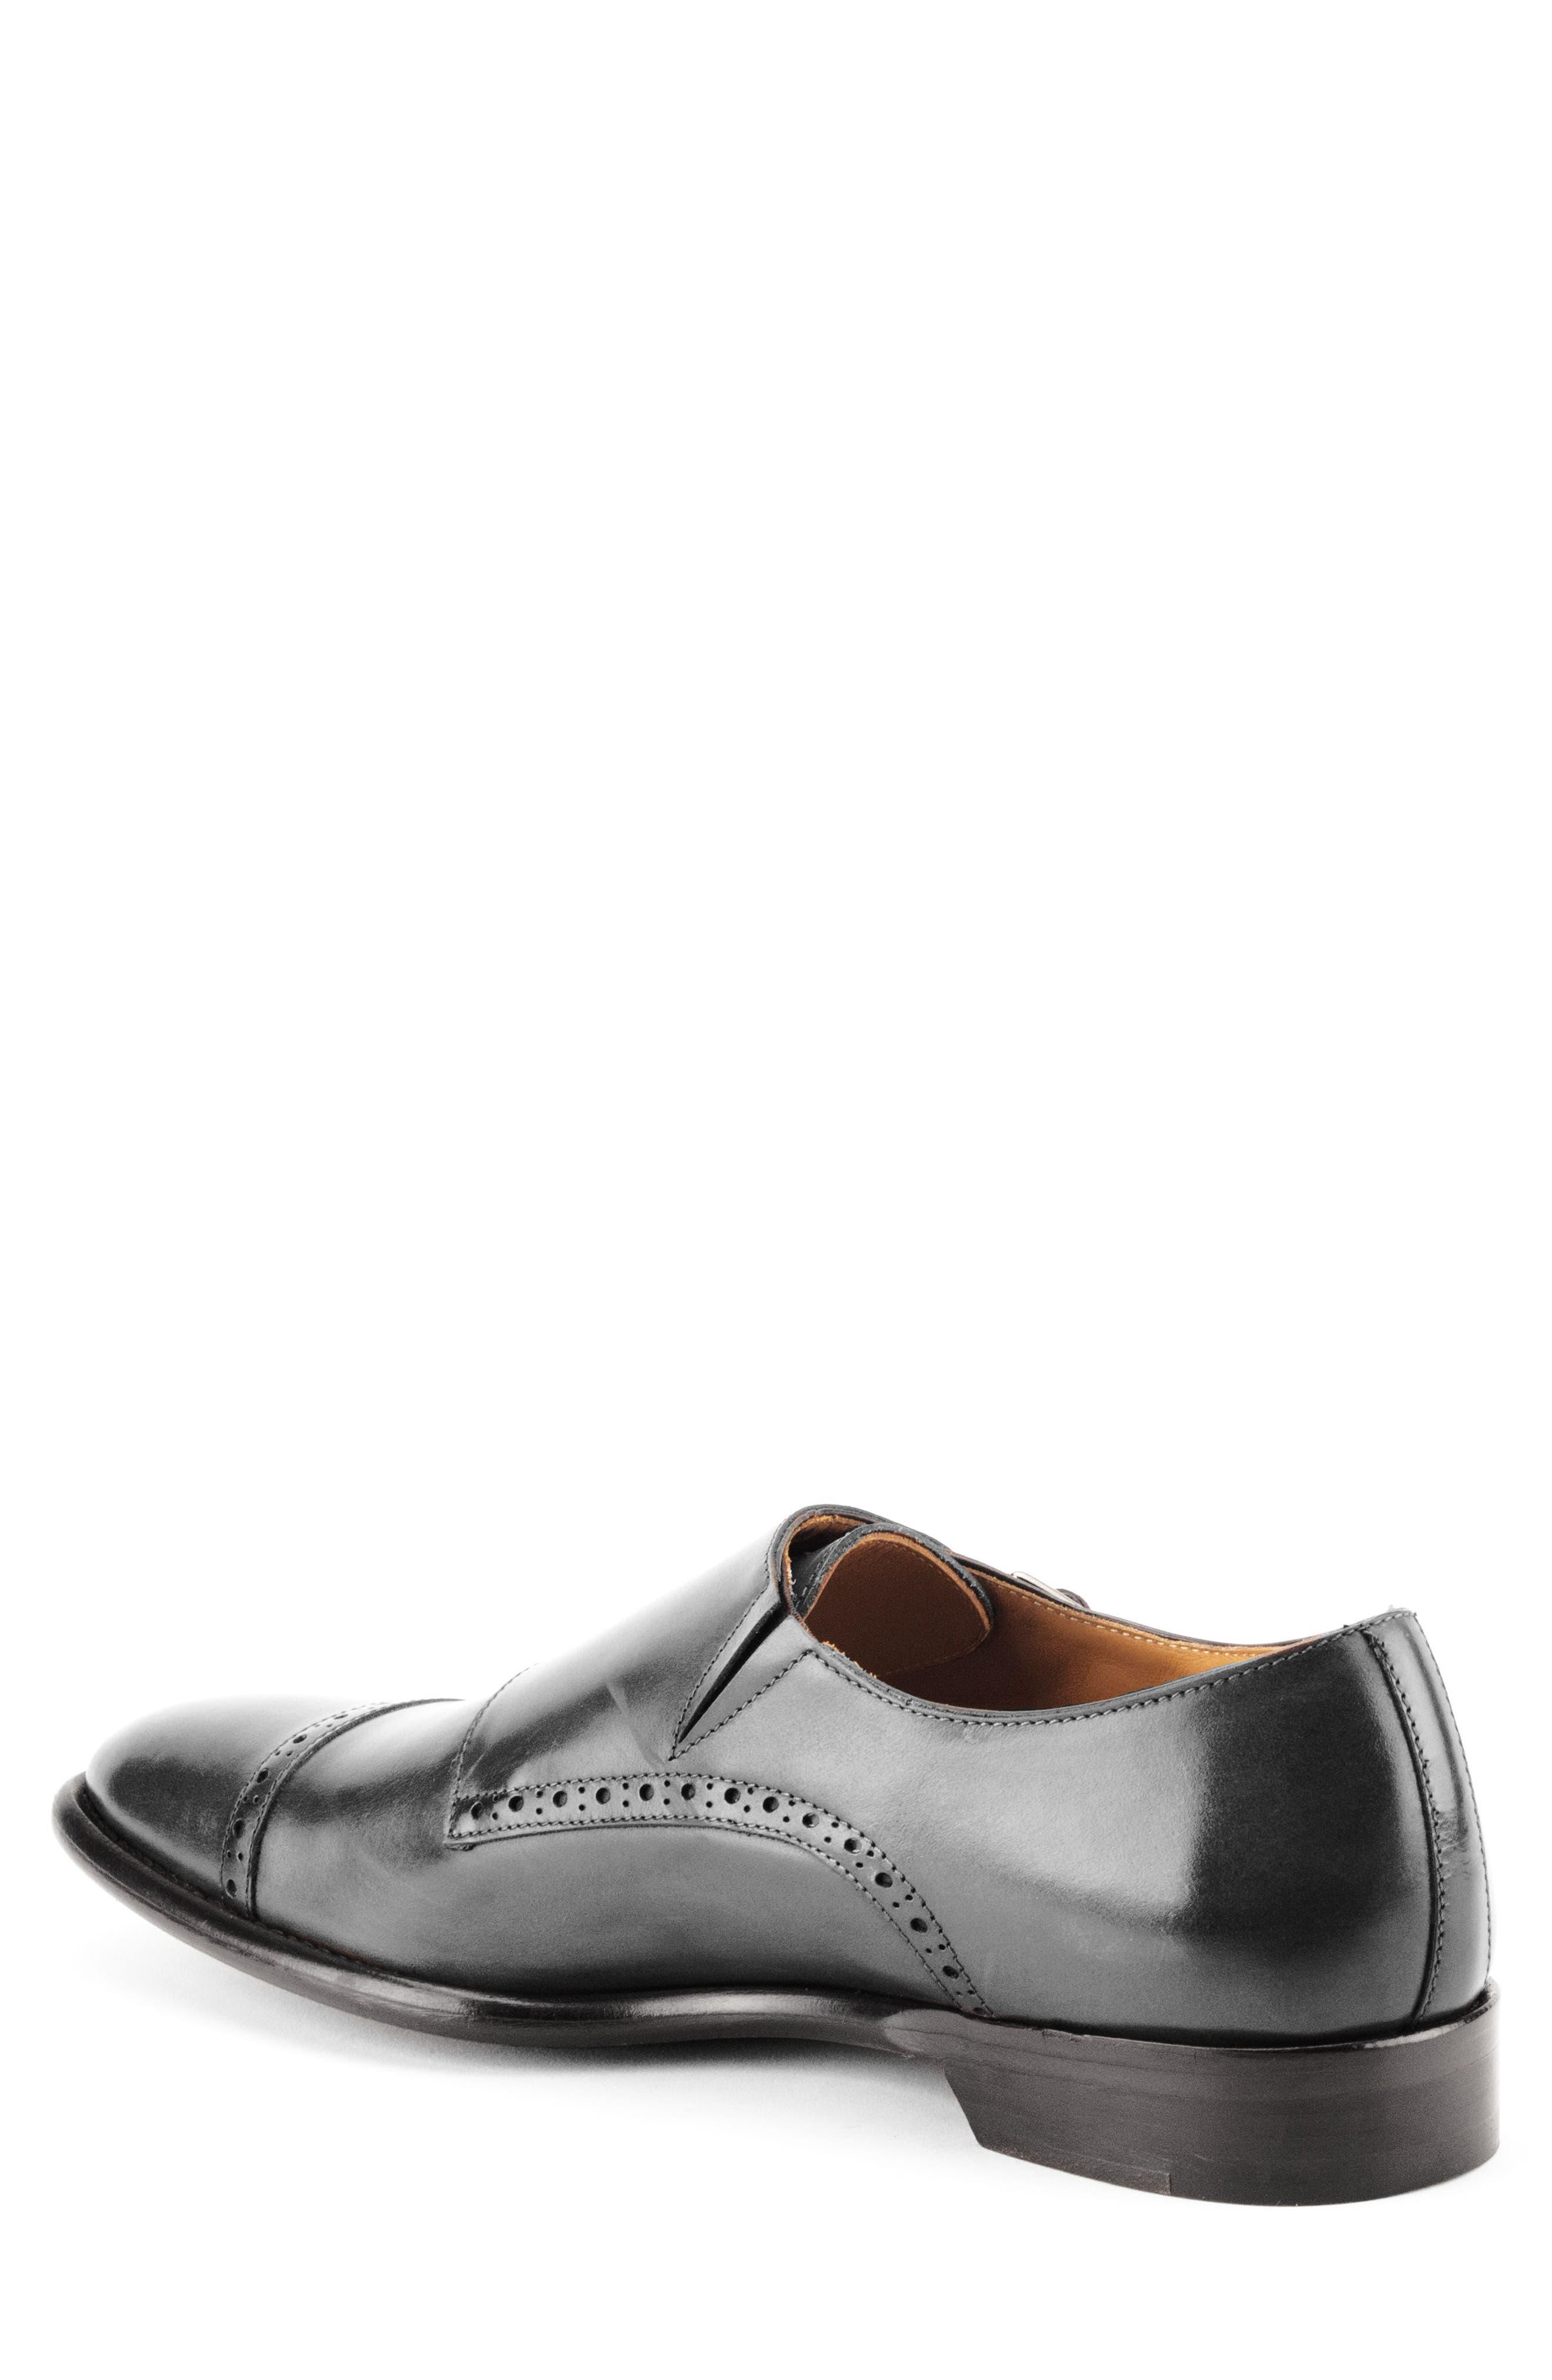 Corbett Cap Toe Double Strap Monk Shoe,                             Alternate thumbnail 2, color,                             Black Leather